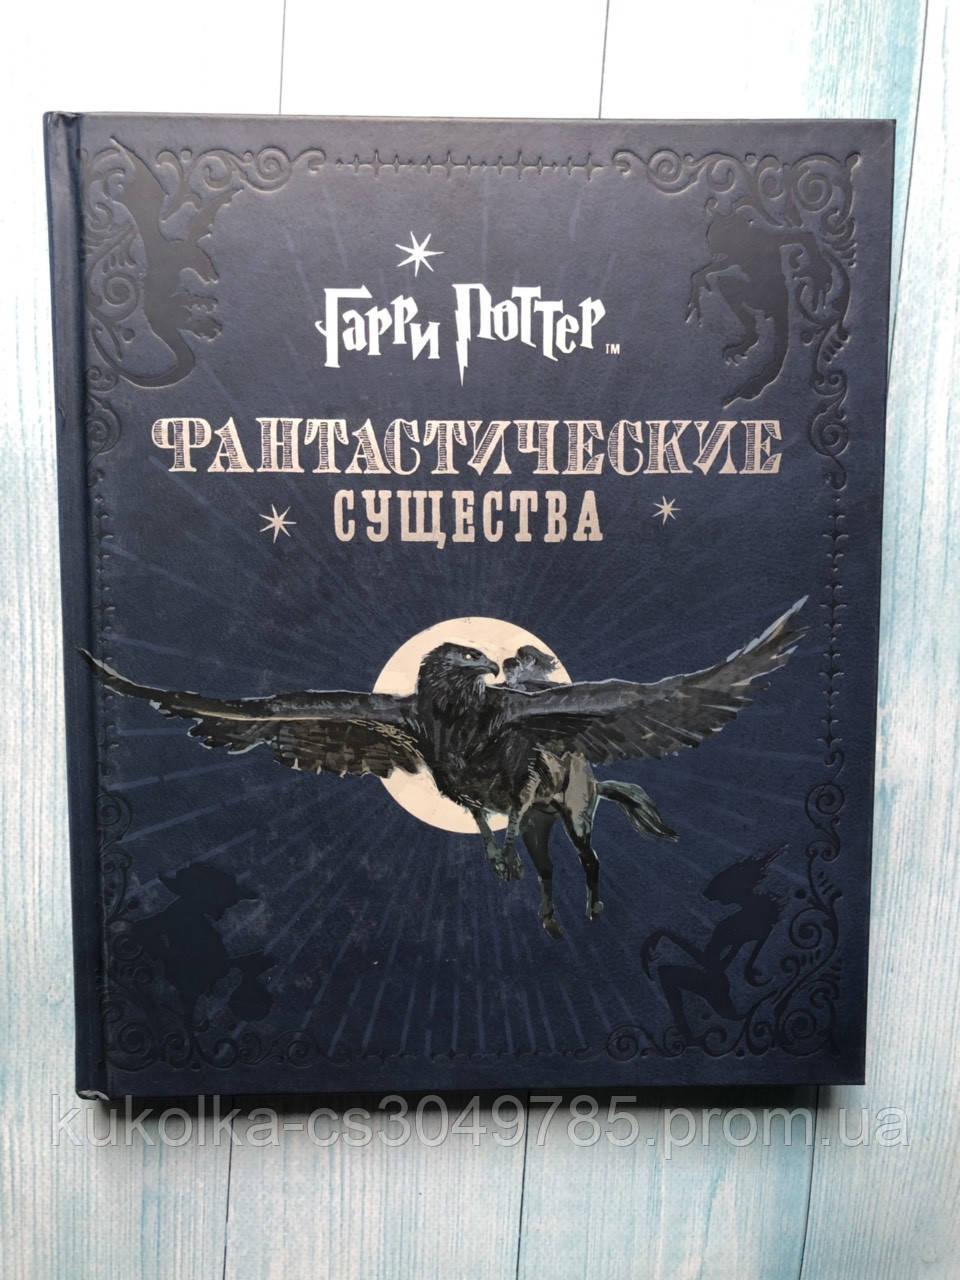 Книга Гарри Поттер Фантастические существа Джоди Ревенсон арт.9785353073451